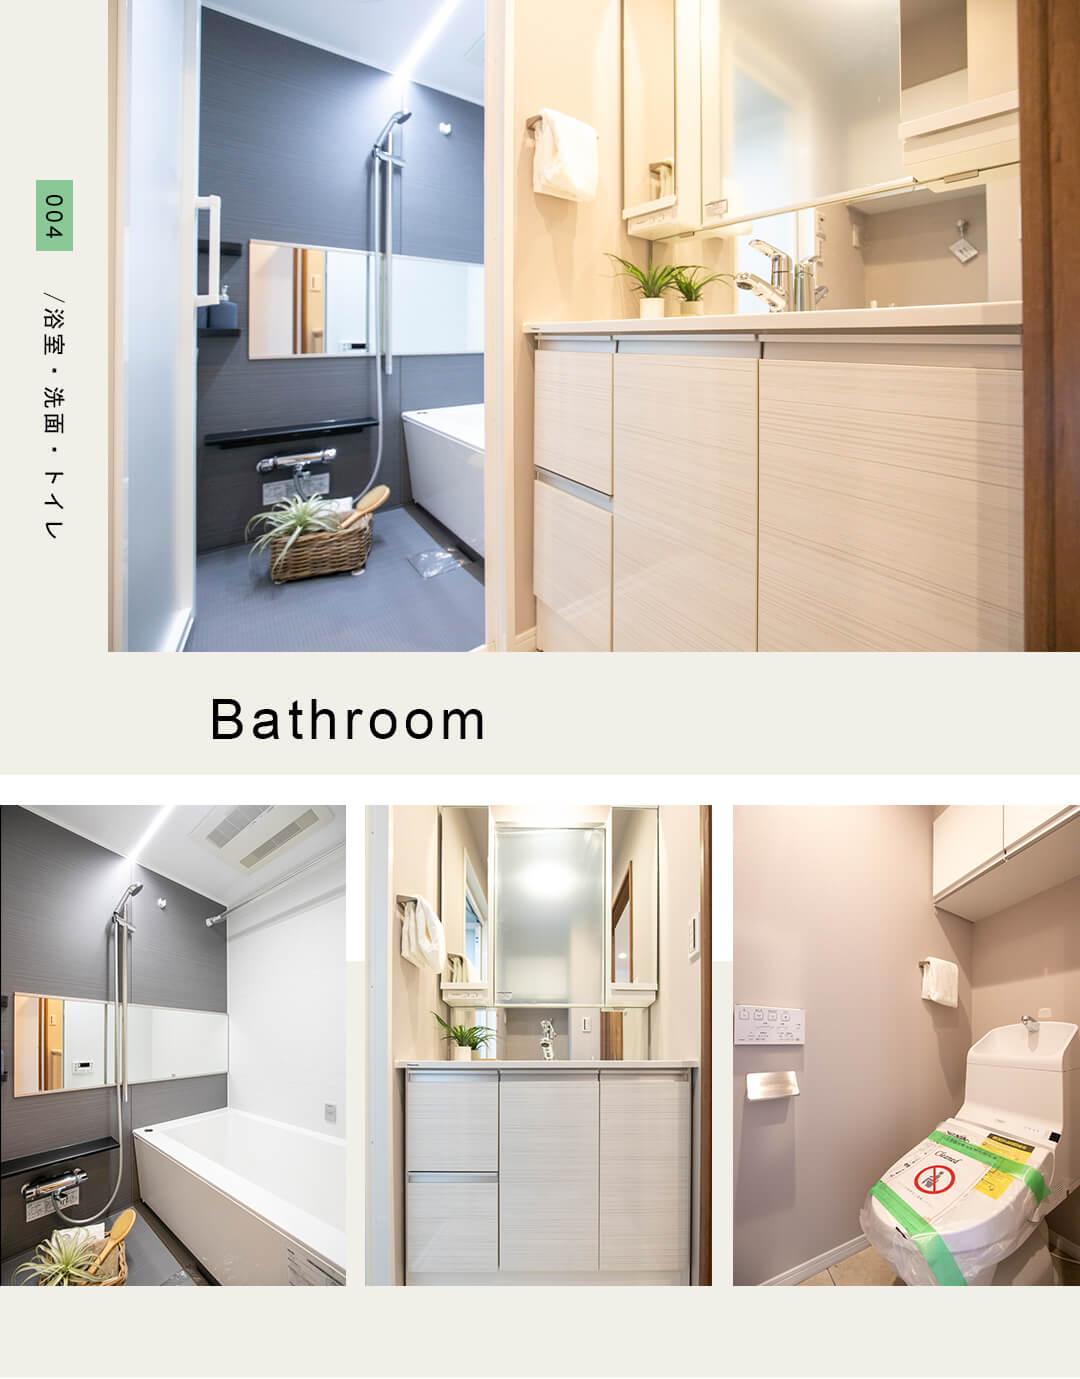 004,Bathroom,浴室.洗面,トイレ